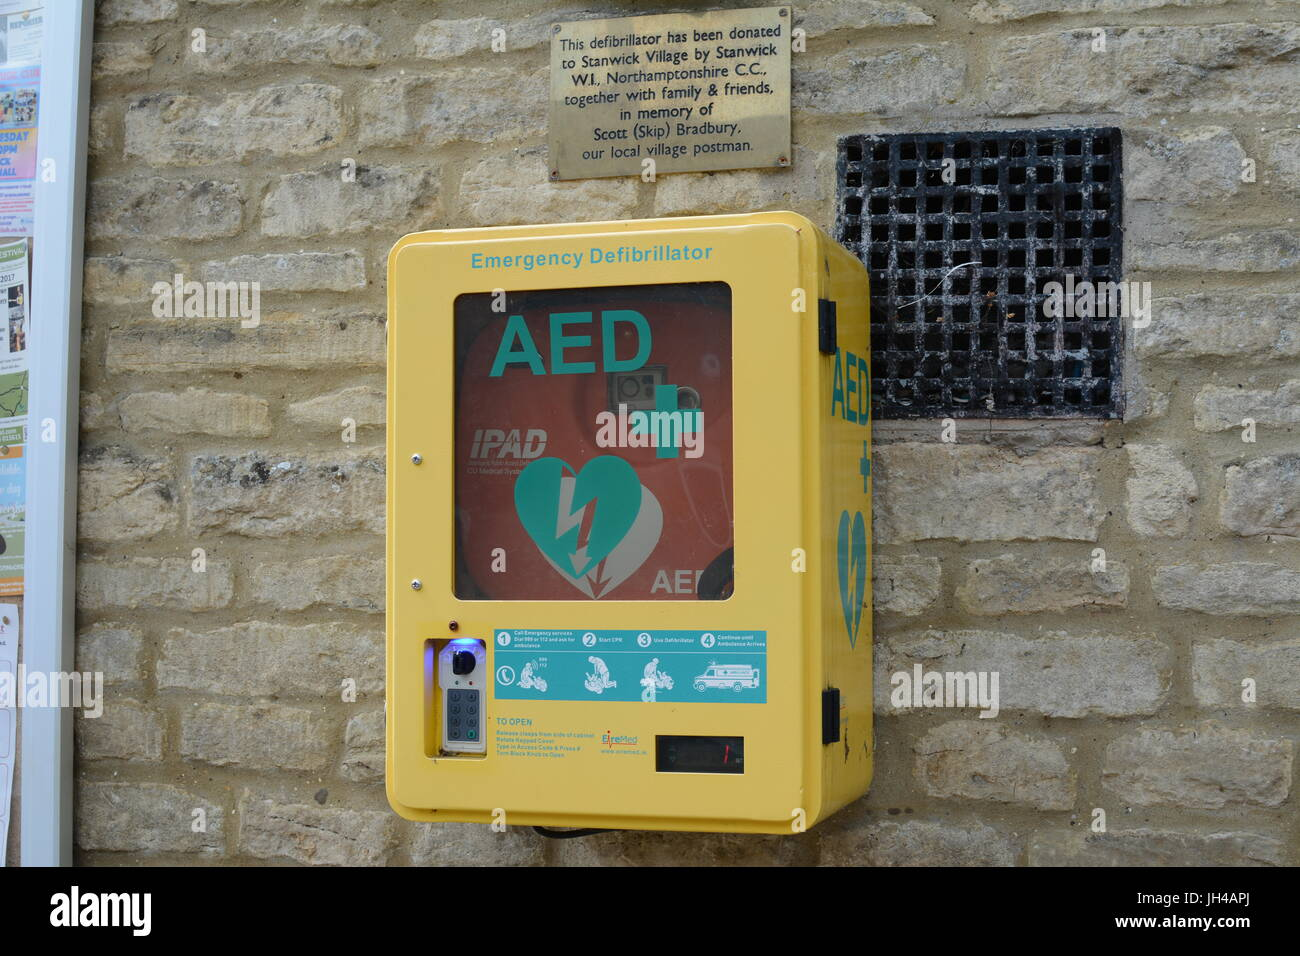 defibrillator - Stock Image